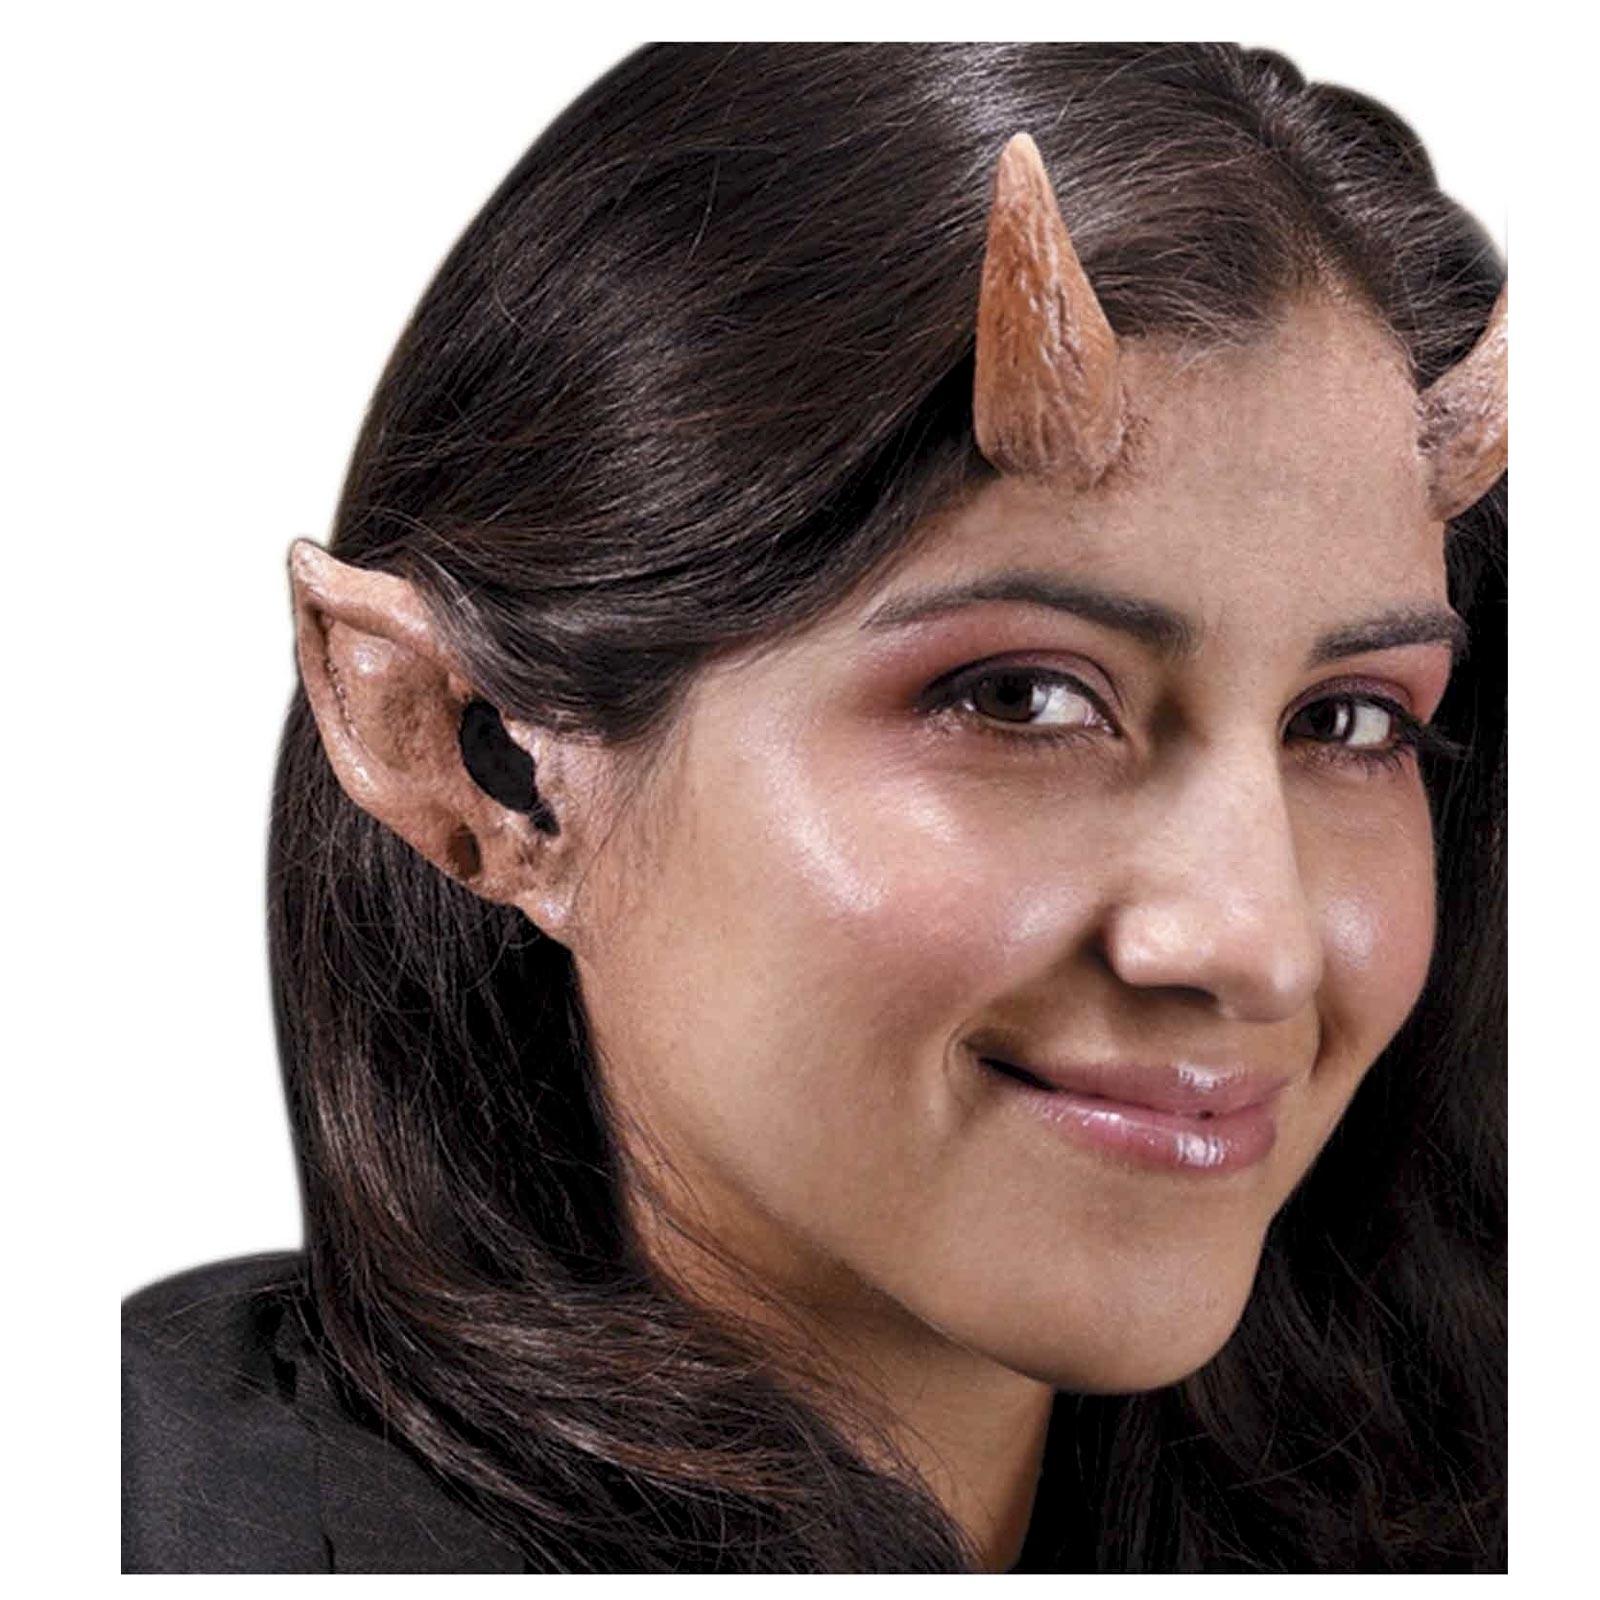 Shop categories  sc 1 st  eBay & Theatrical F/X Effects Latex prosthetic Fantasy EARS the Hobbit Elf ...